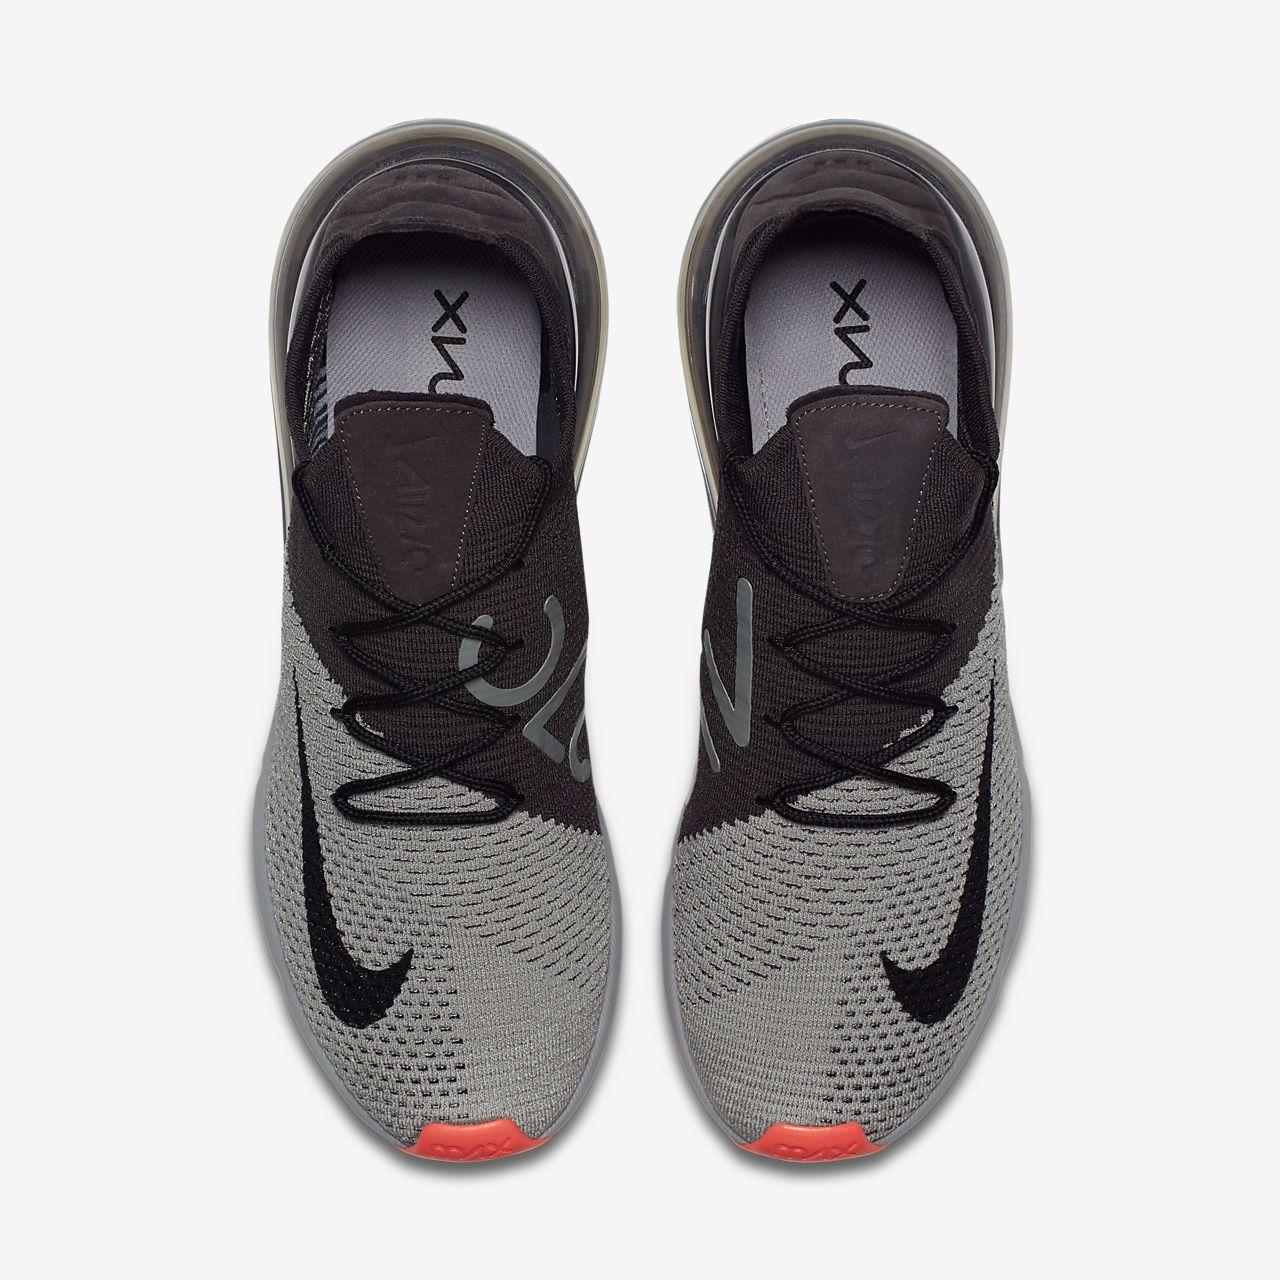 89a7ae04ef00 Nike Air Max 270 Flyknit Men s Shoe. Nike.com CA